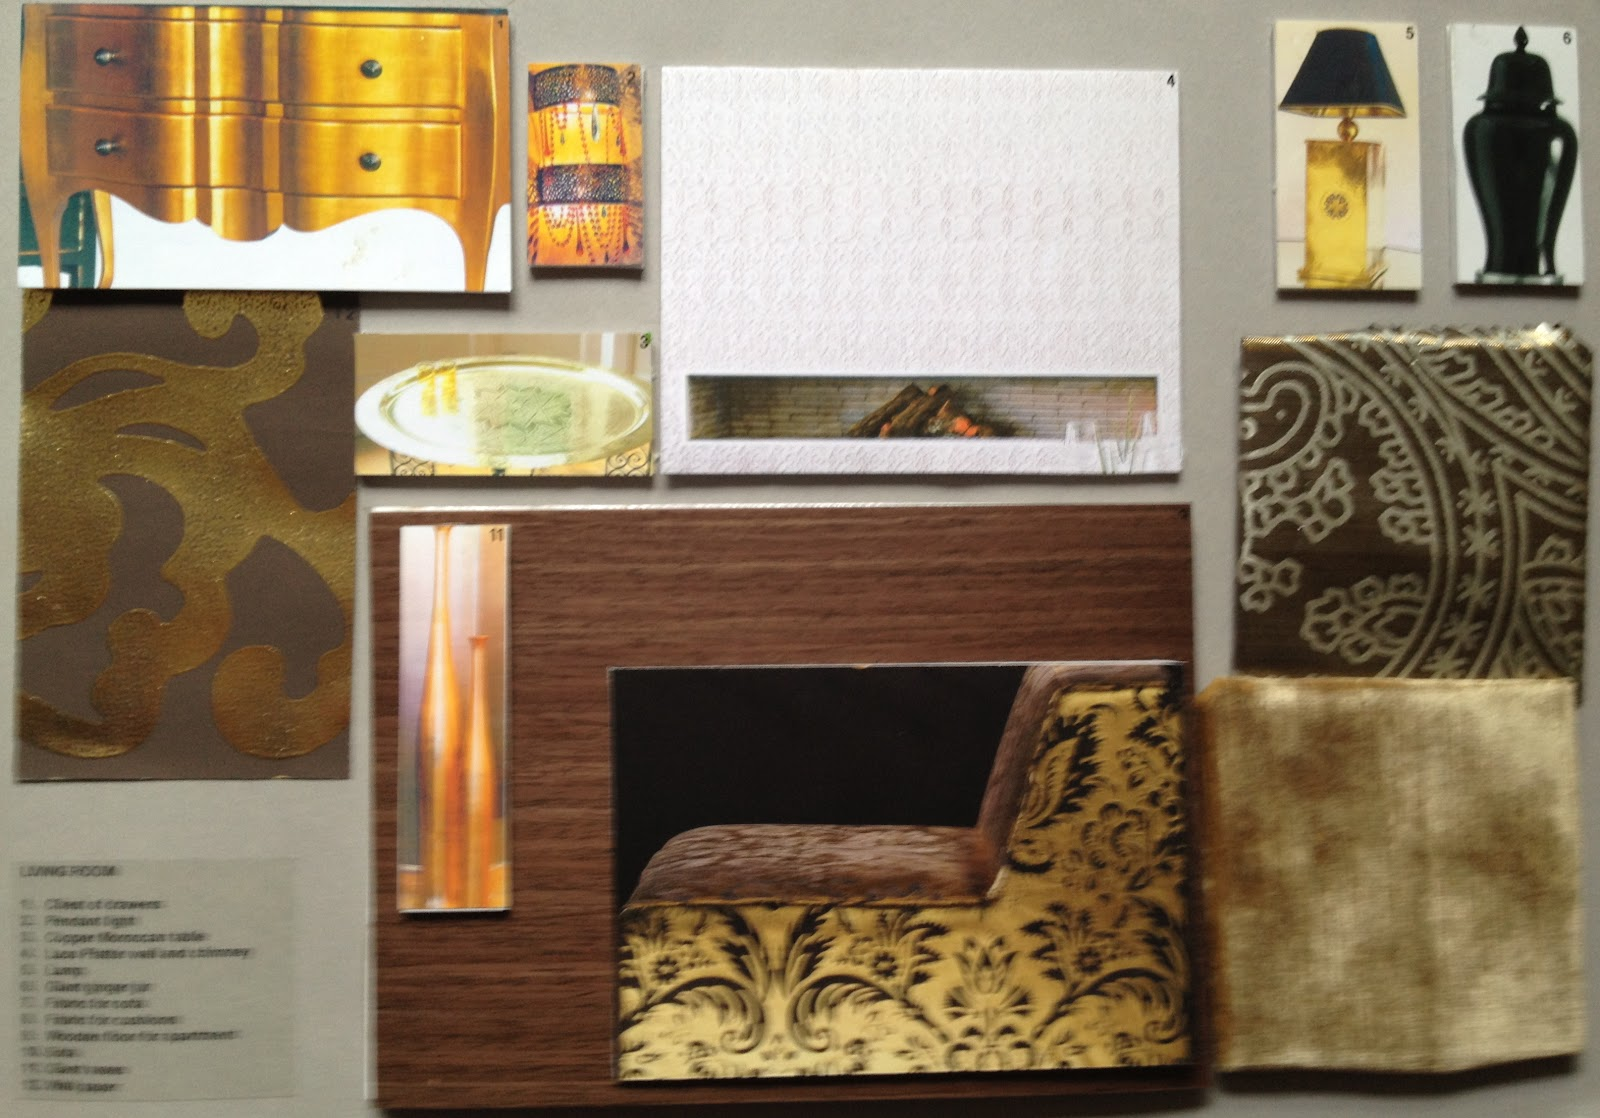 Inspiration, interiors and...